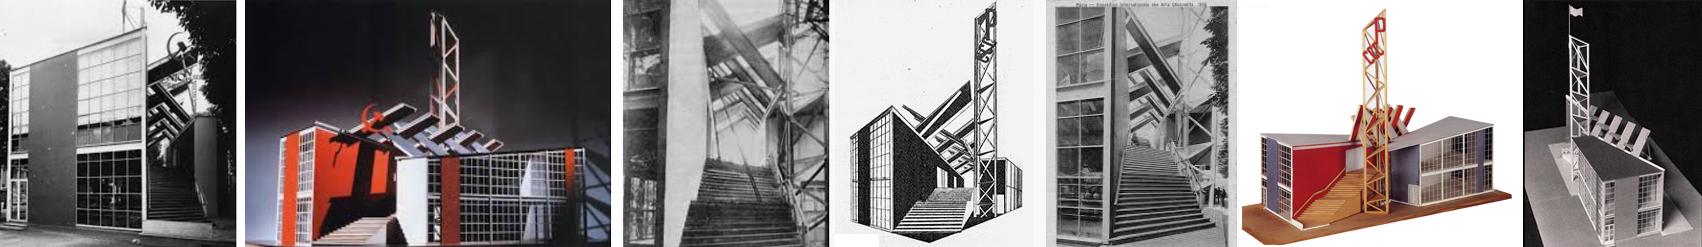 Melnikov - URSS Pavilion, Parigi, 1925